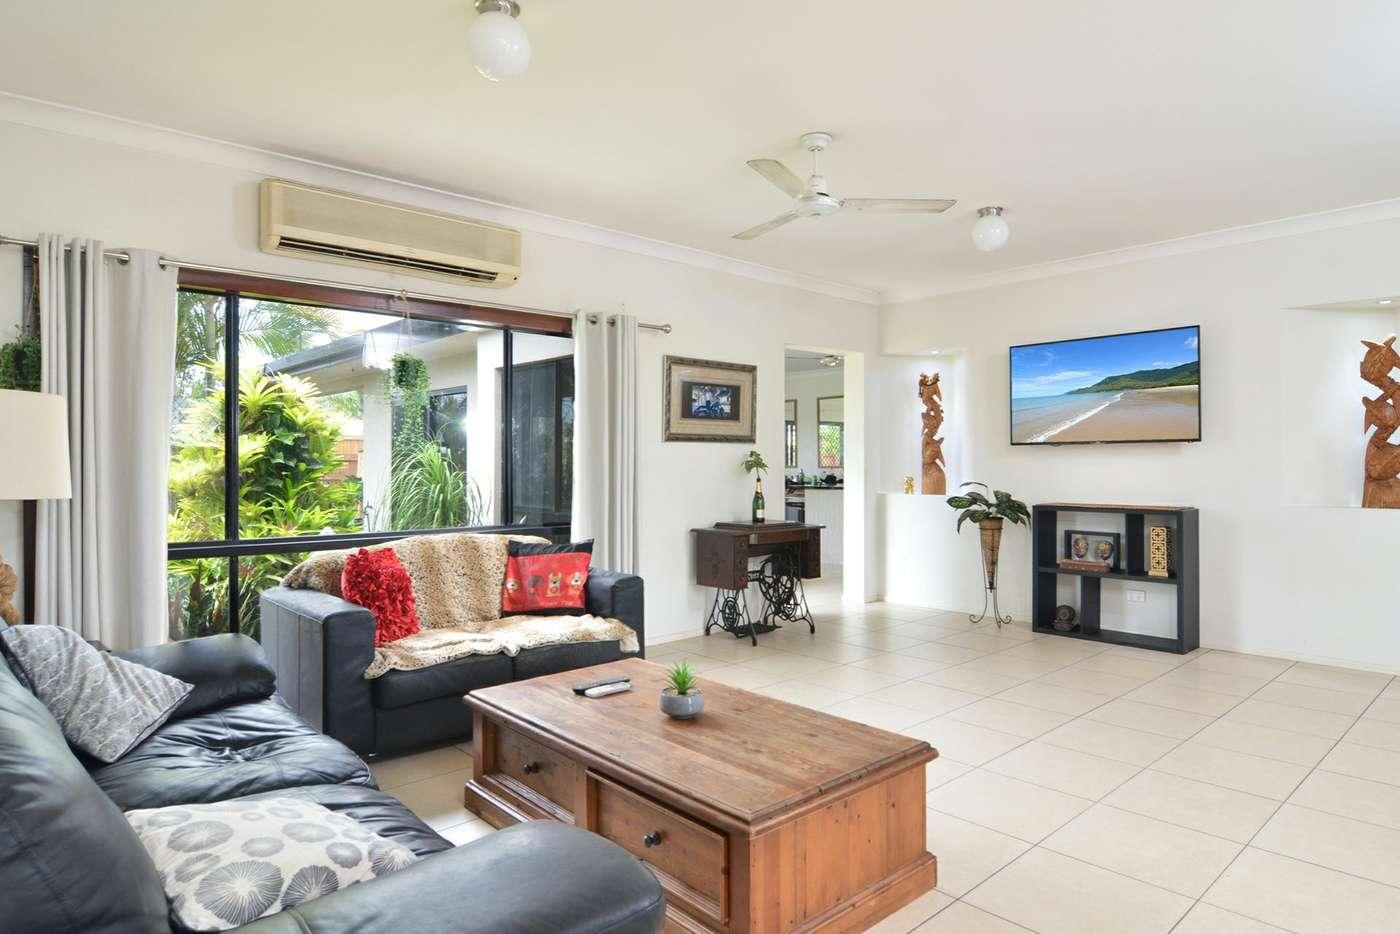 Main view of Homely house listing, 62 Cooya Beach Road, Cooya Beach QLD 4873